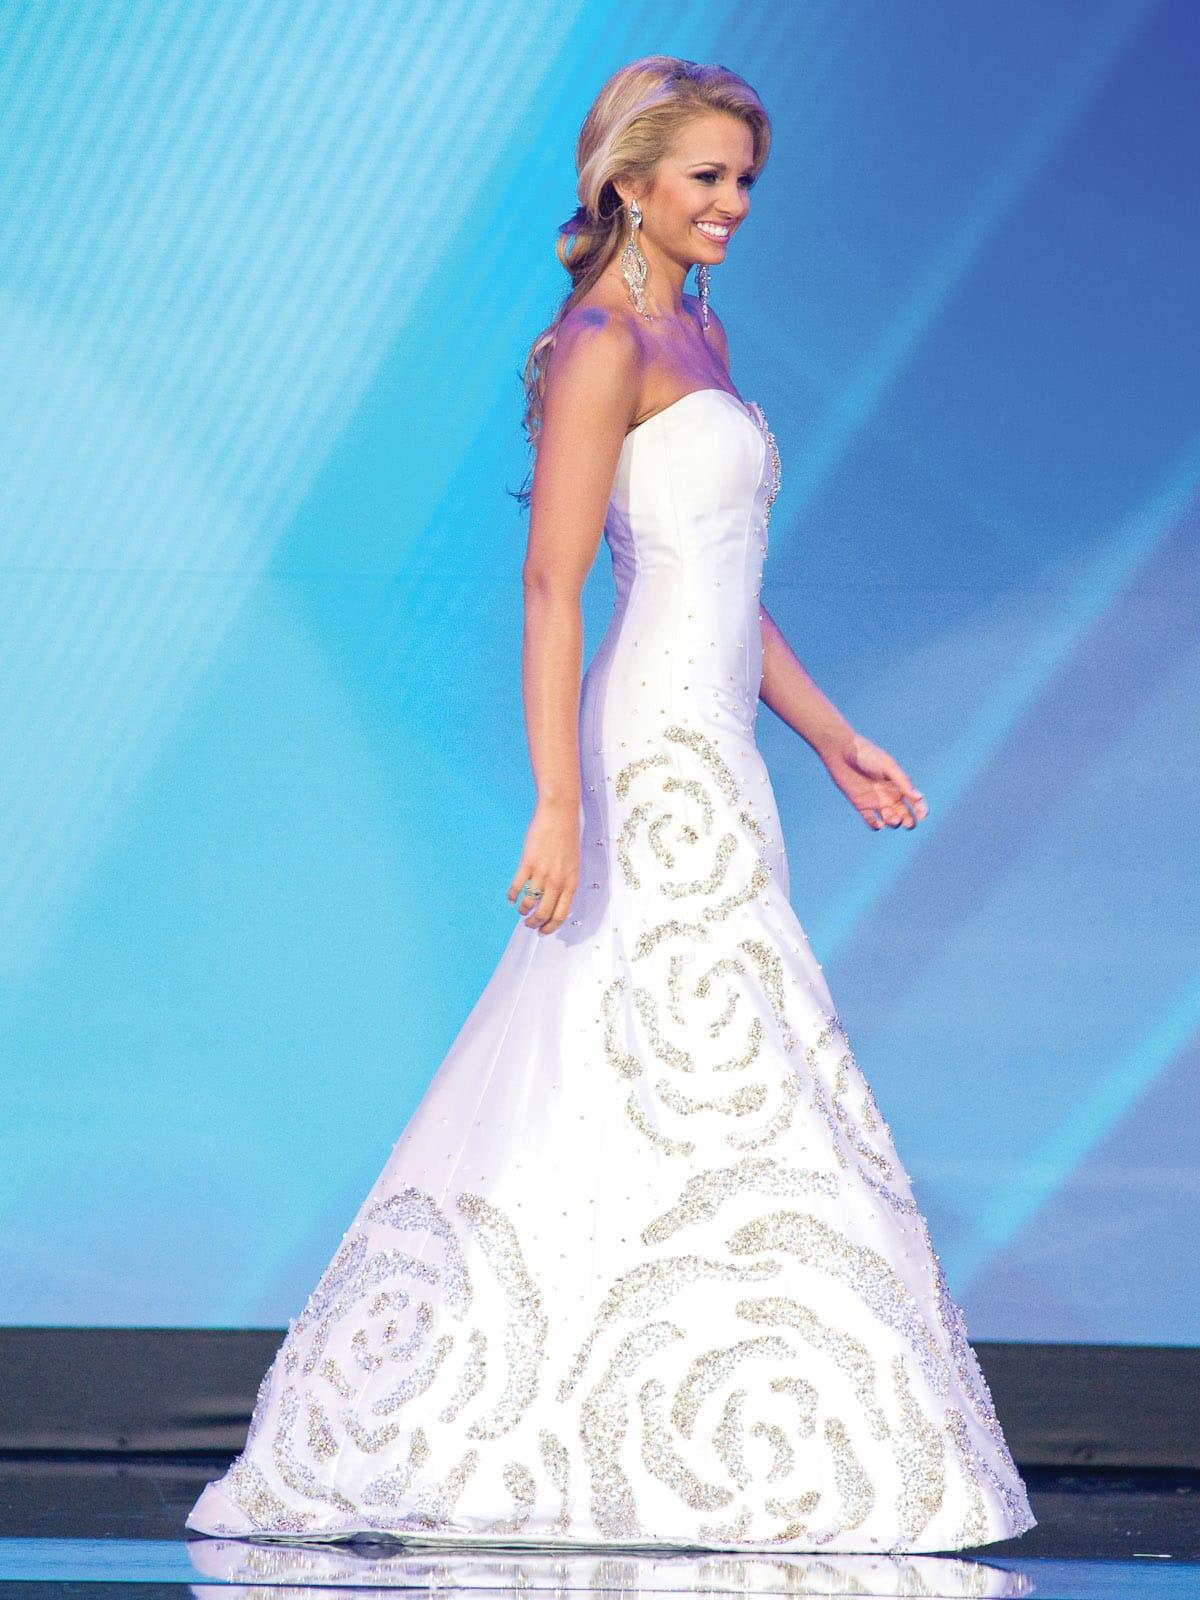 Gionni Straccia, January 2013, gowns, Danielle Doty